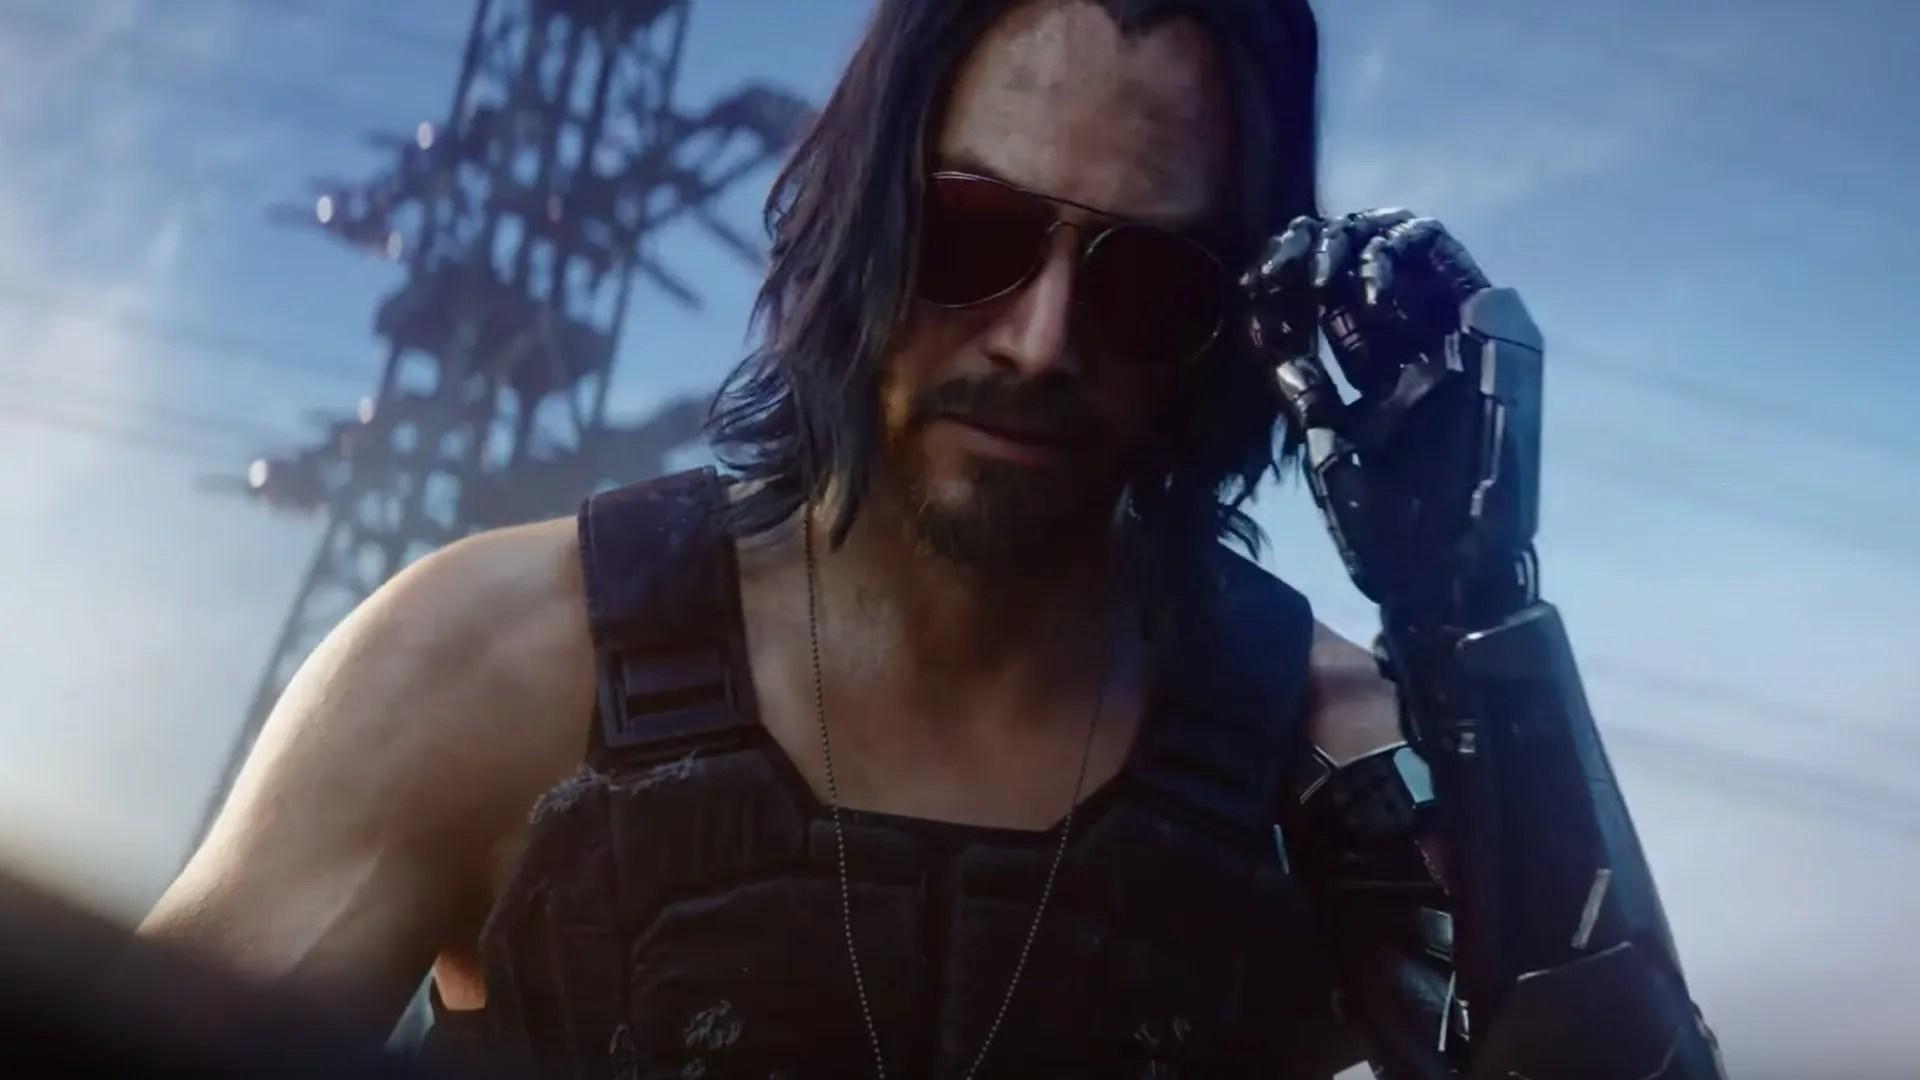 Keanu Reeves appears in the video game 'Cyberpunk 2077.'